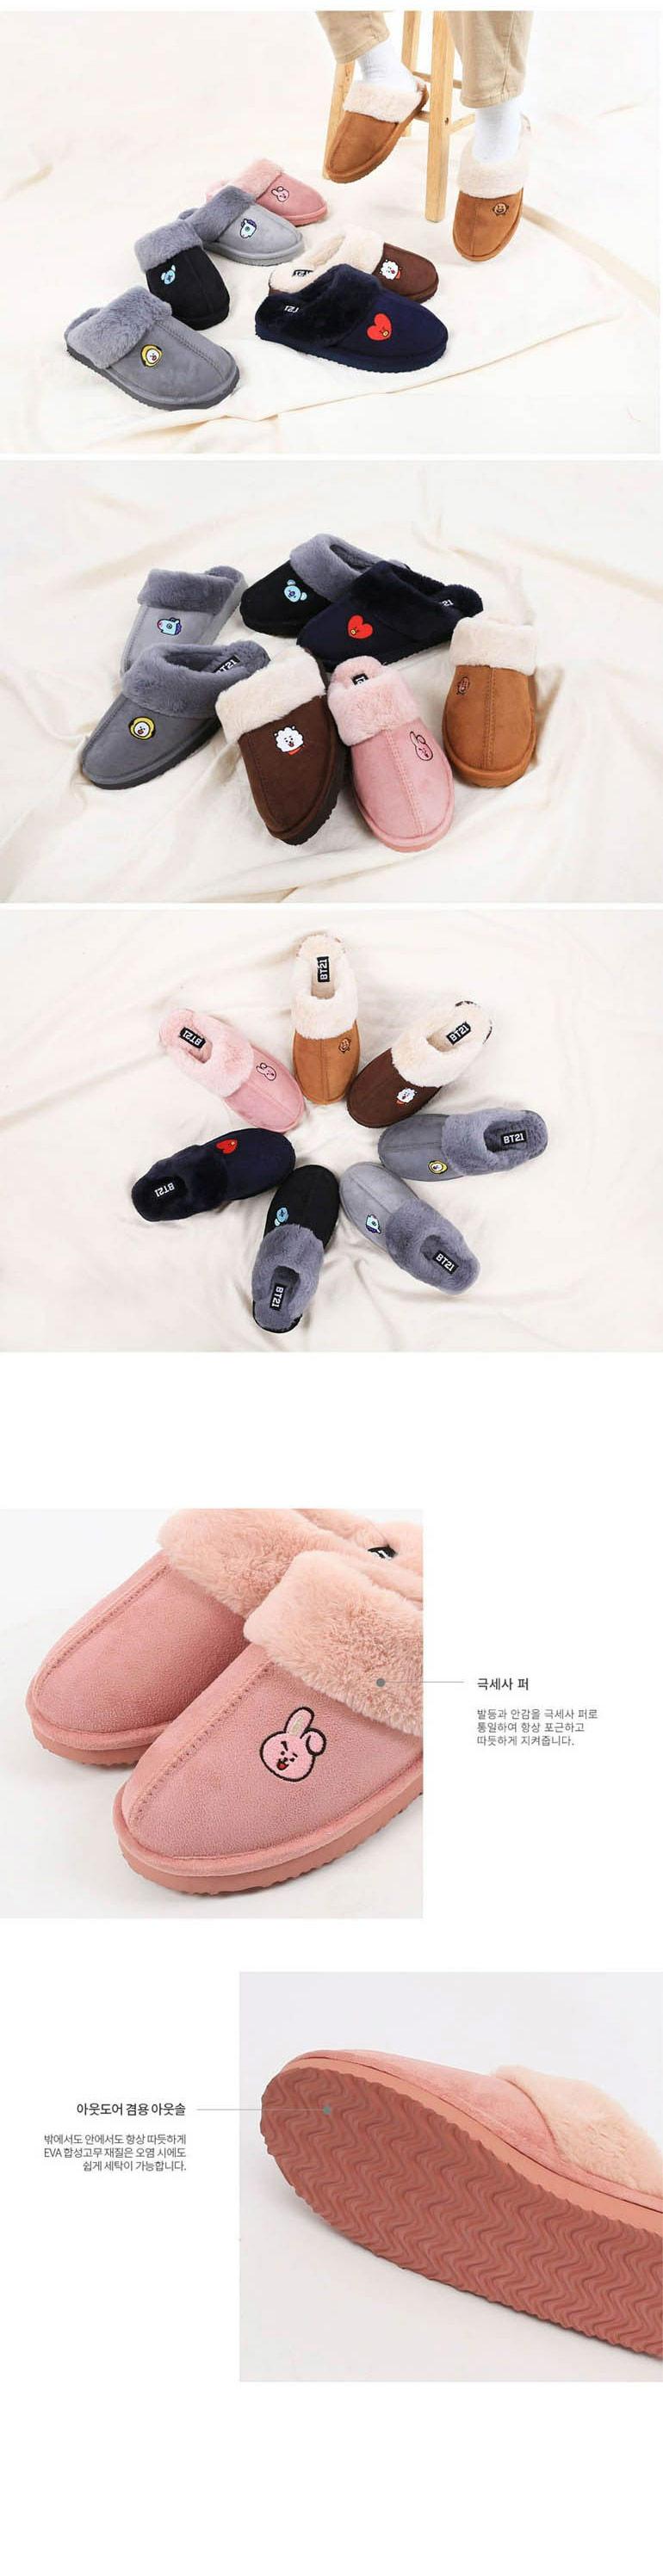 bt21_happy_wintershoes-2